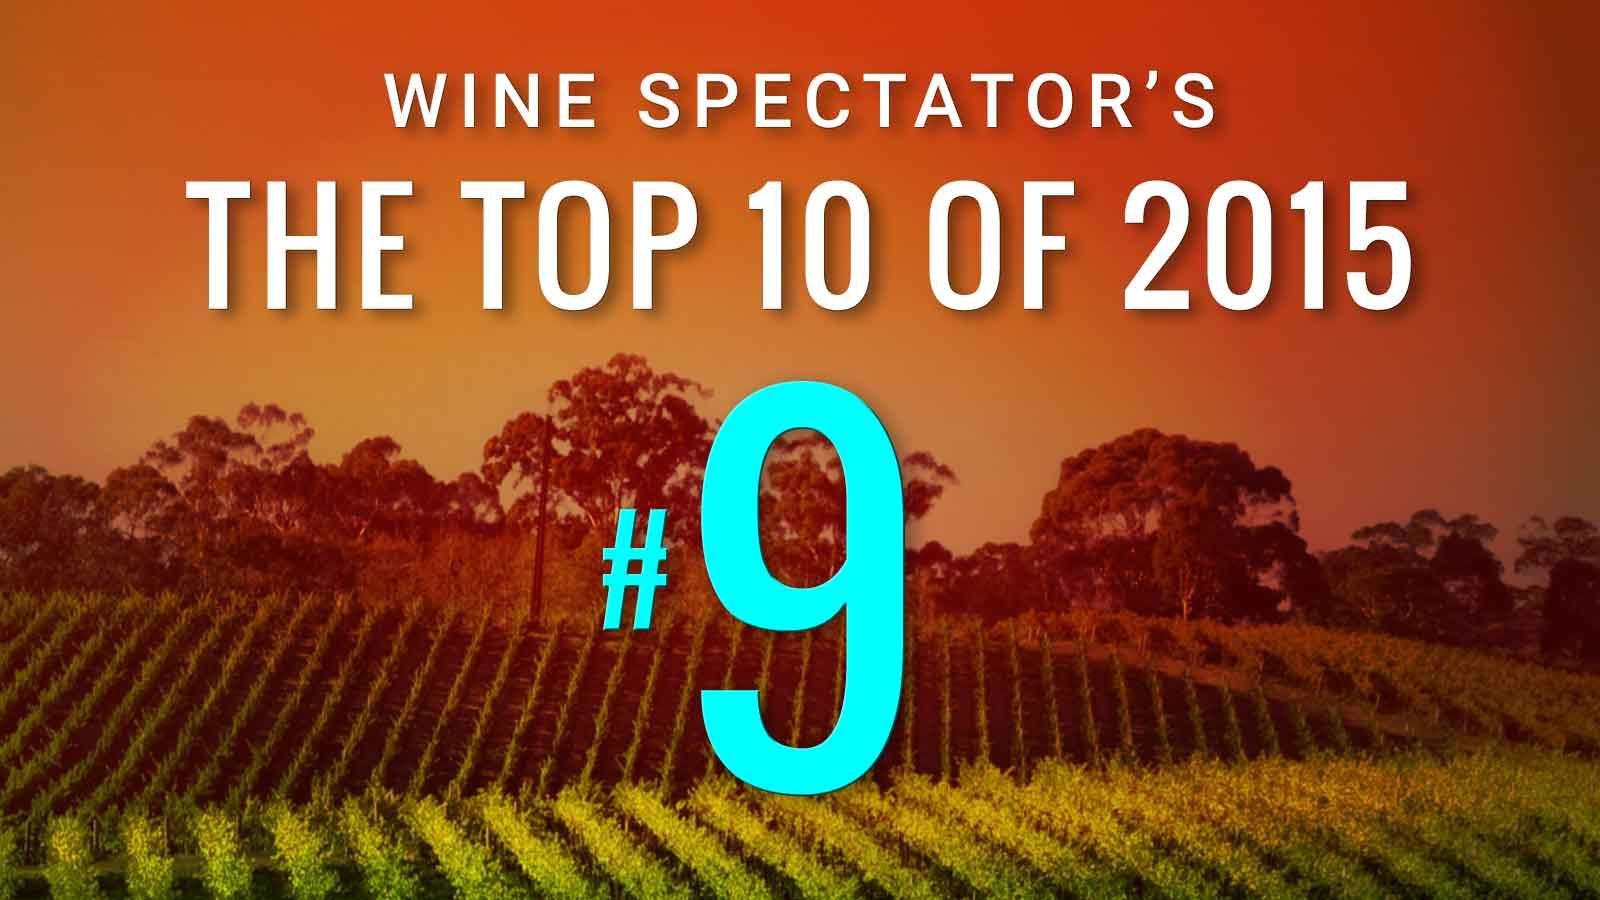 Top 10 Wines Of 2015 Wine Spectator S Top 100 Wine Spectator Wine Reviews Wine